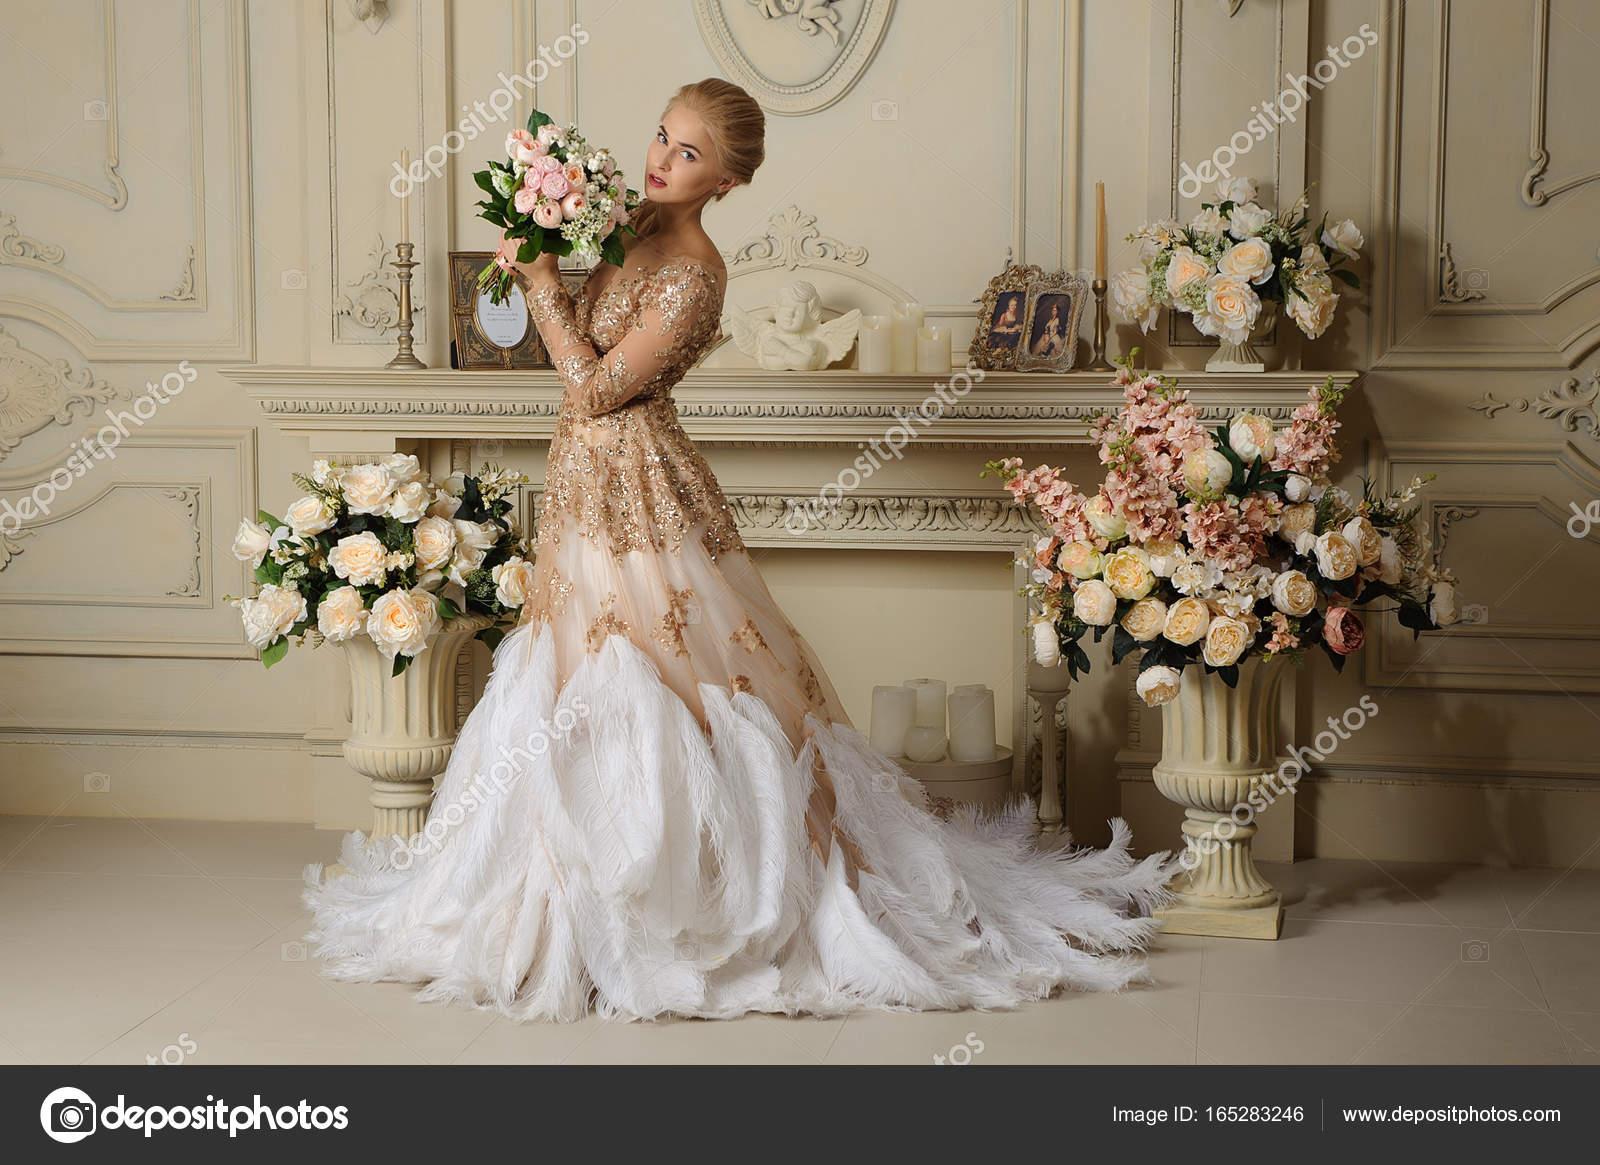 538bf6328938 Krásná smyslná dívka blondýna v béžové šaty v retro interiér– stock obrázky